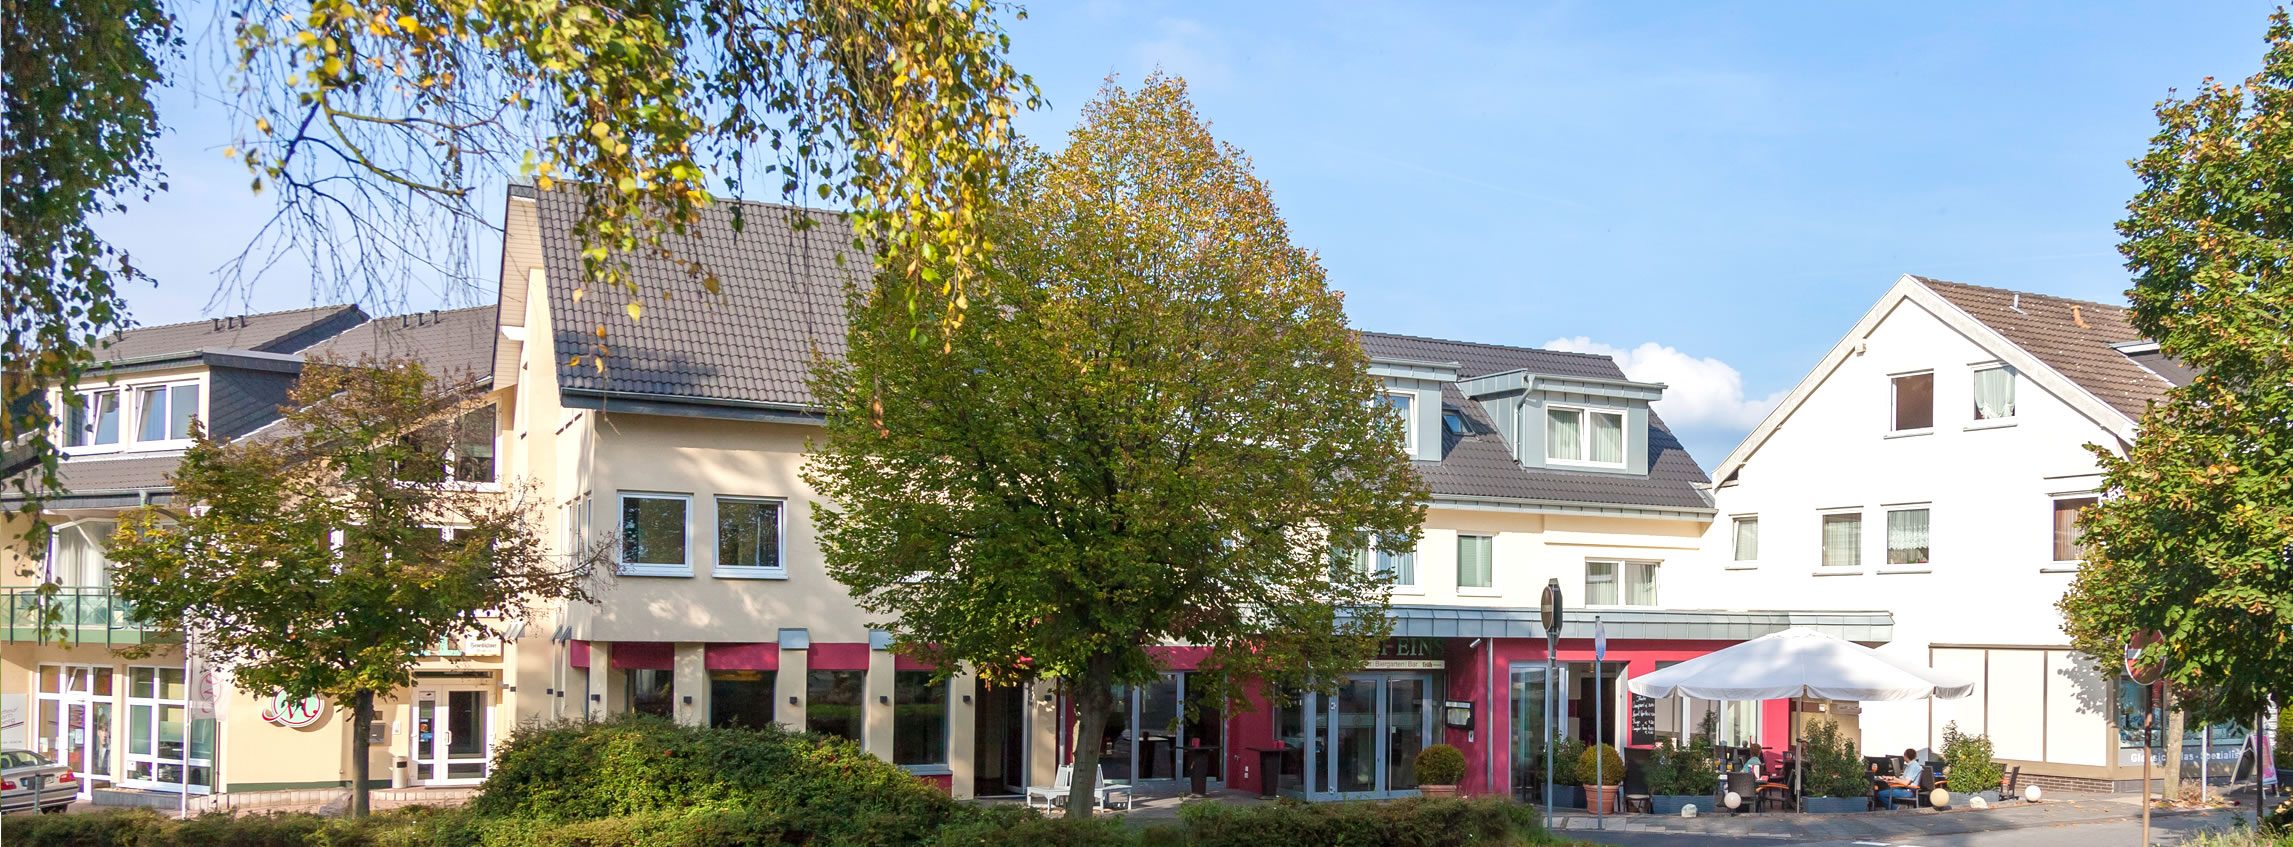 Hotel Am Markt Bad Honnef  Bad Honnef